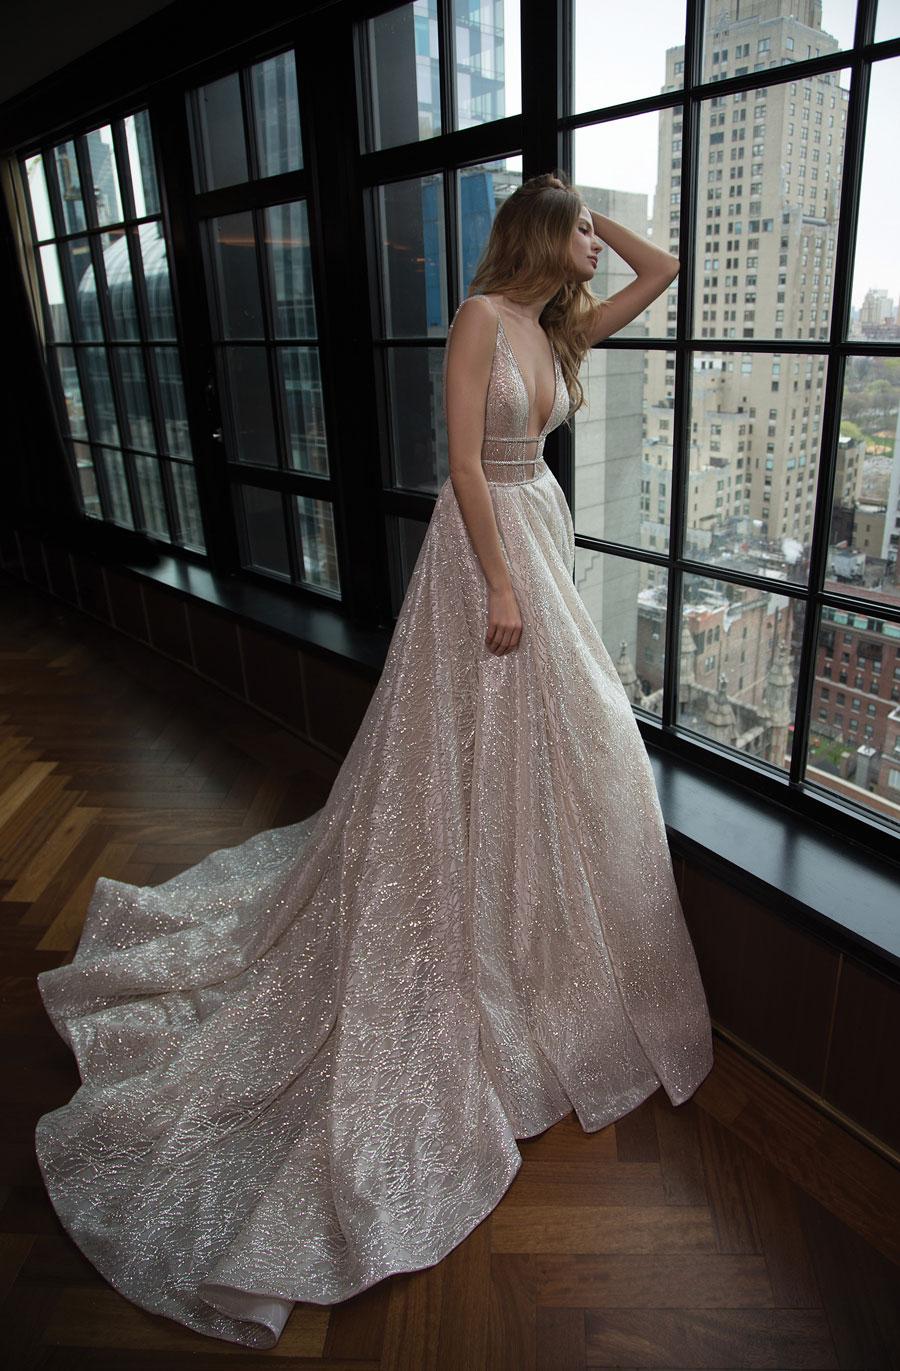 Berta-Bridal-Wedding-Dresses-Fall-Winter-2016-Bridal-Collection-00035